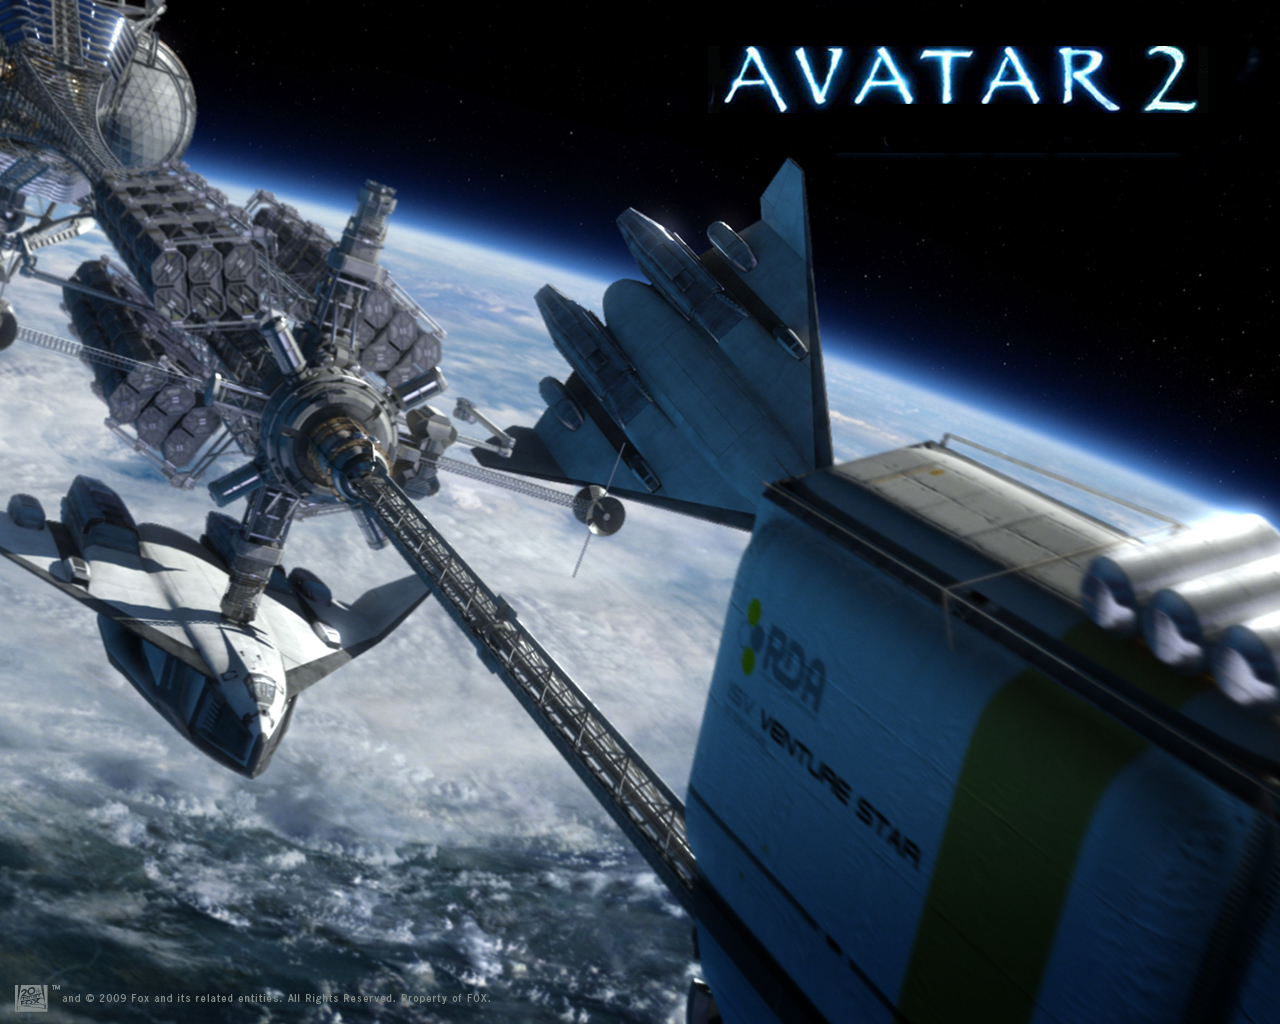 http://3.bp.blogspot.com/-p5lmwt012ow/TxKz9E-bsXI/AAAAAAAAADg/UOXj58P6GYw/s1600/Avatar_2_Wallpaper.jpg